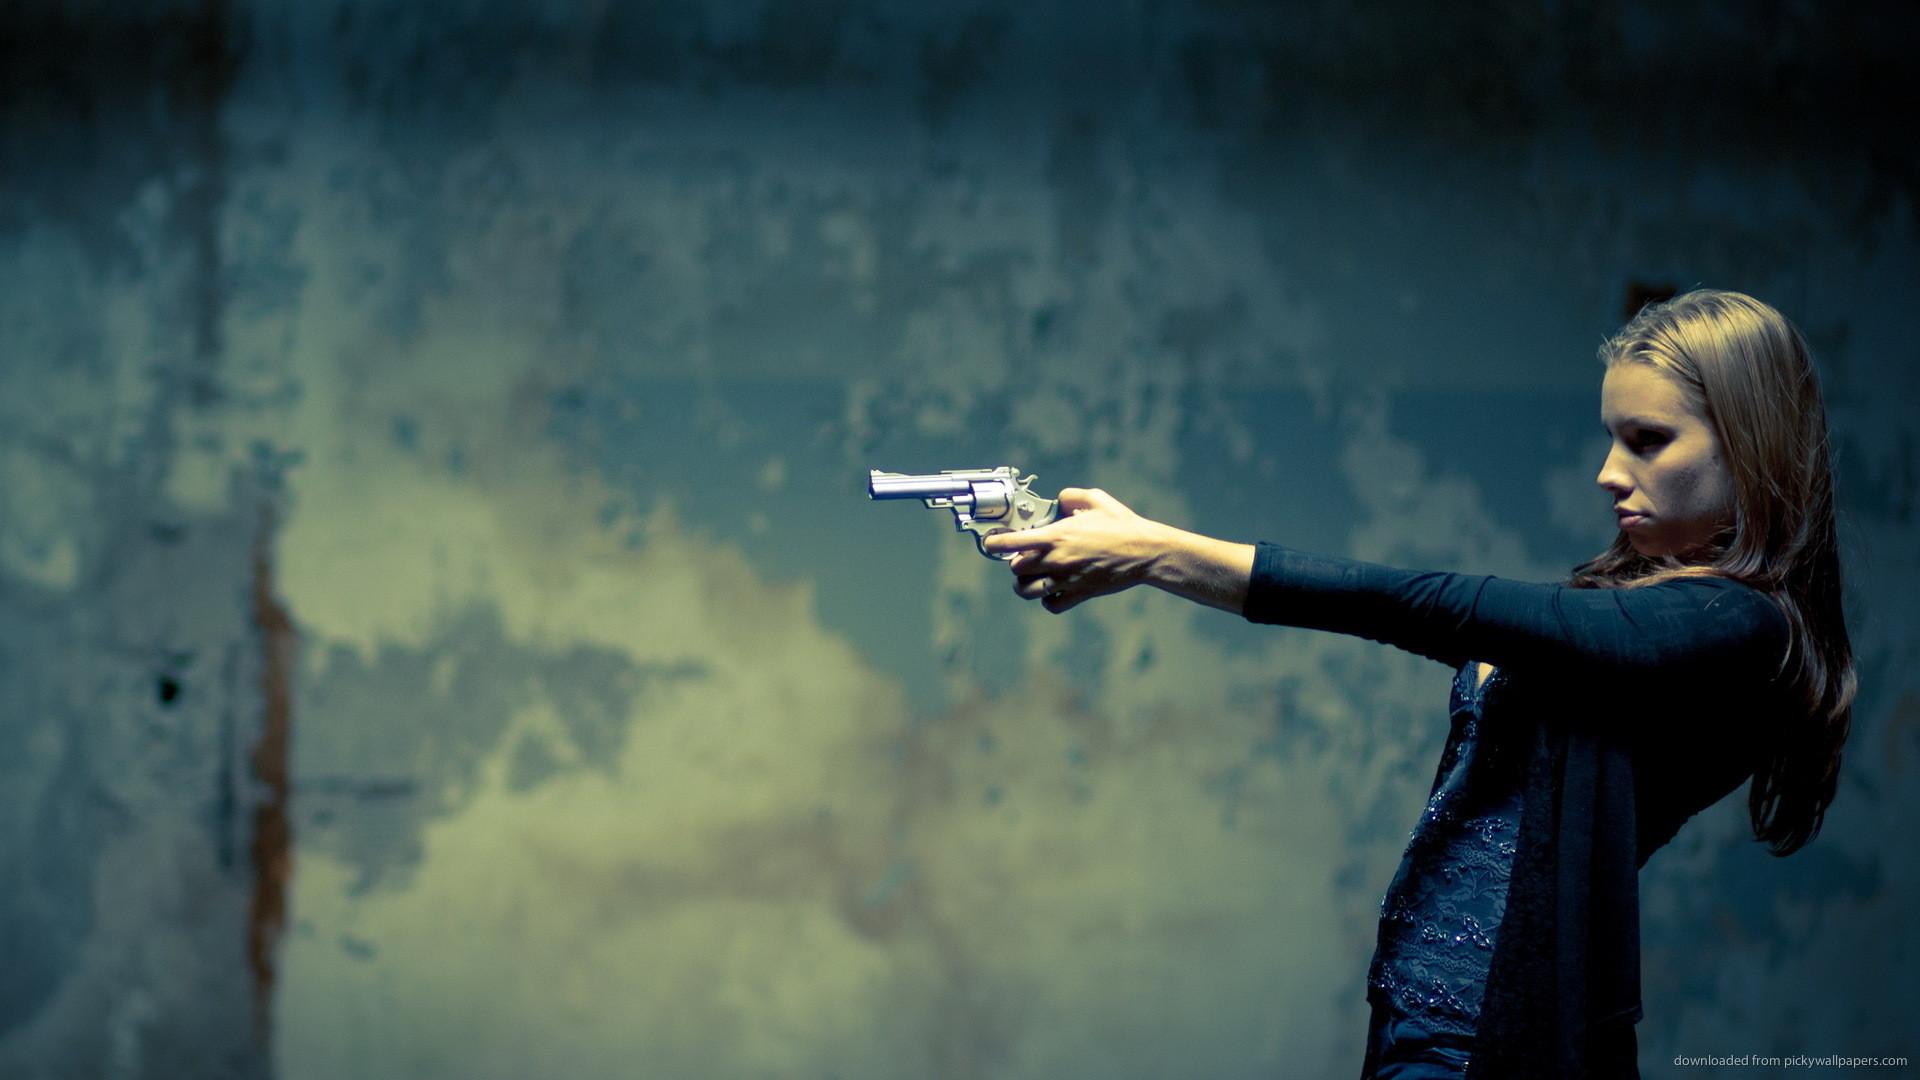 Girl with Gun Wallpaper (55+ images)